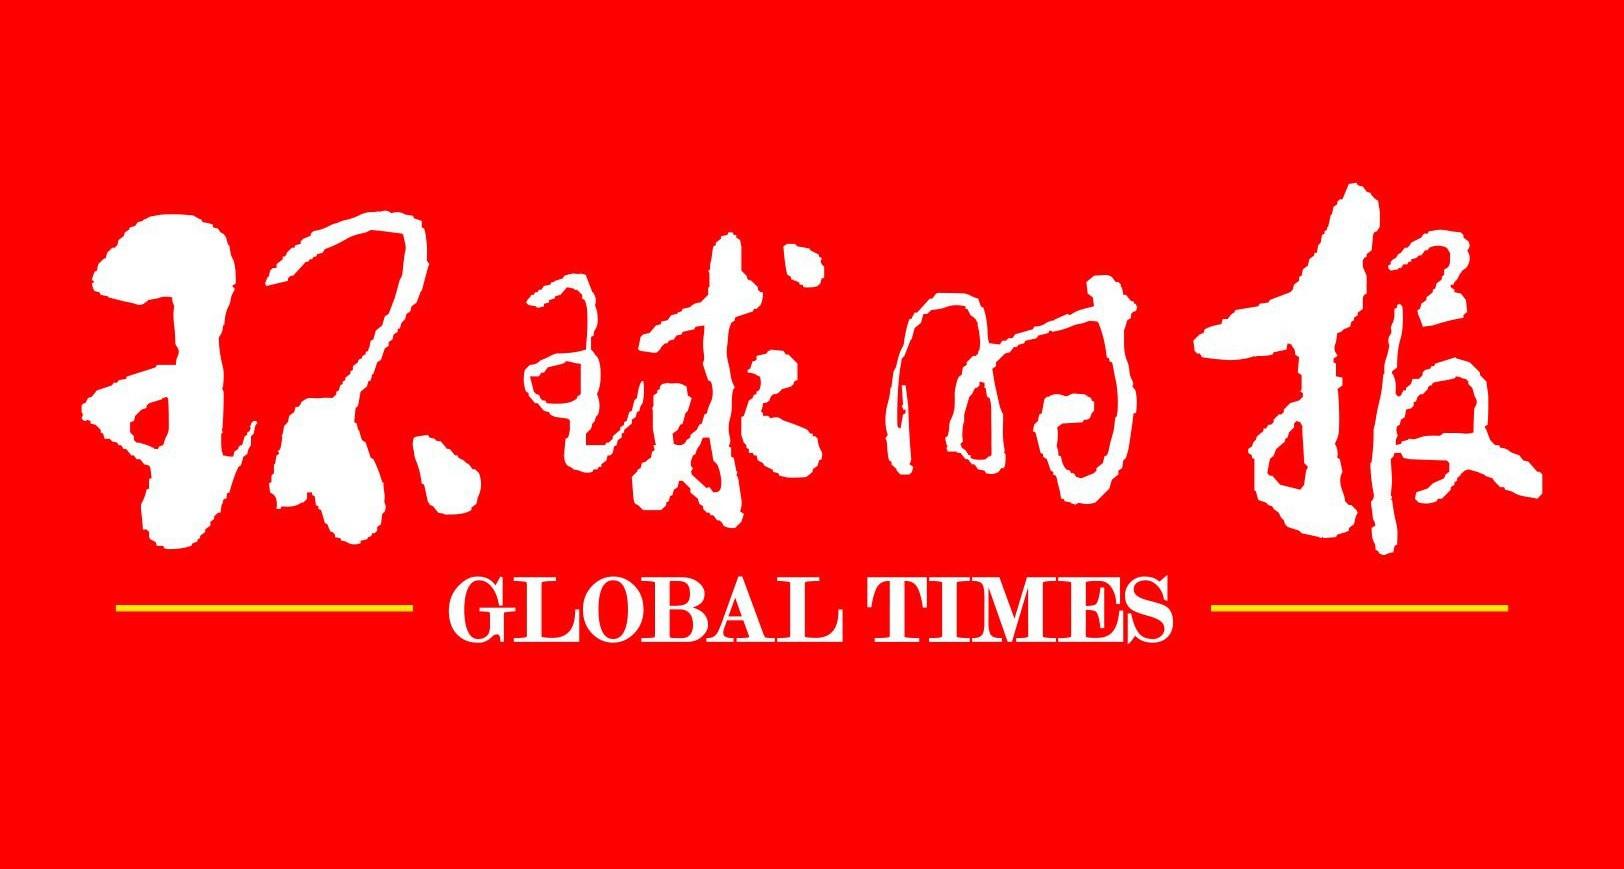 环球时报logo